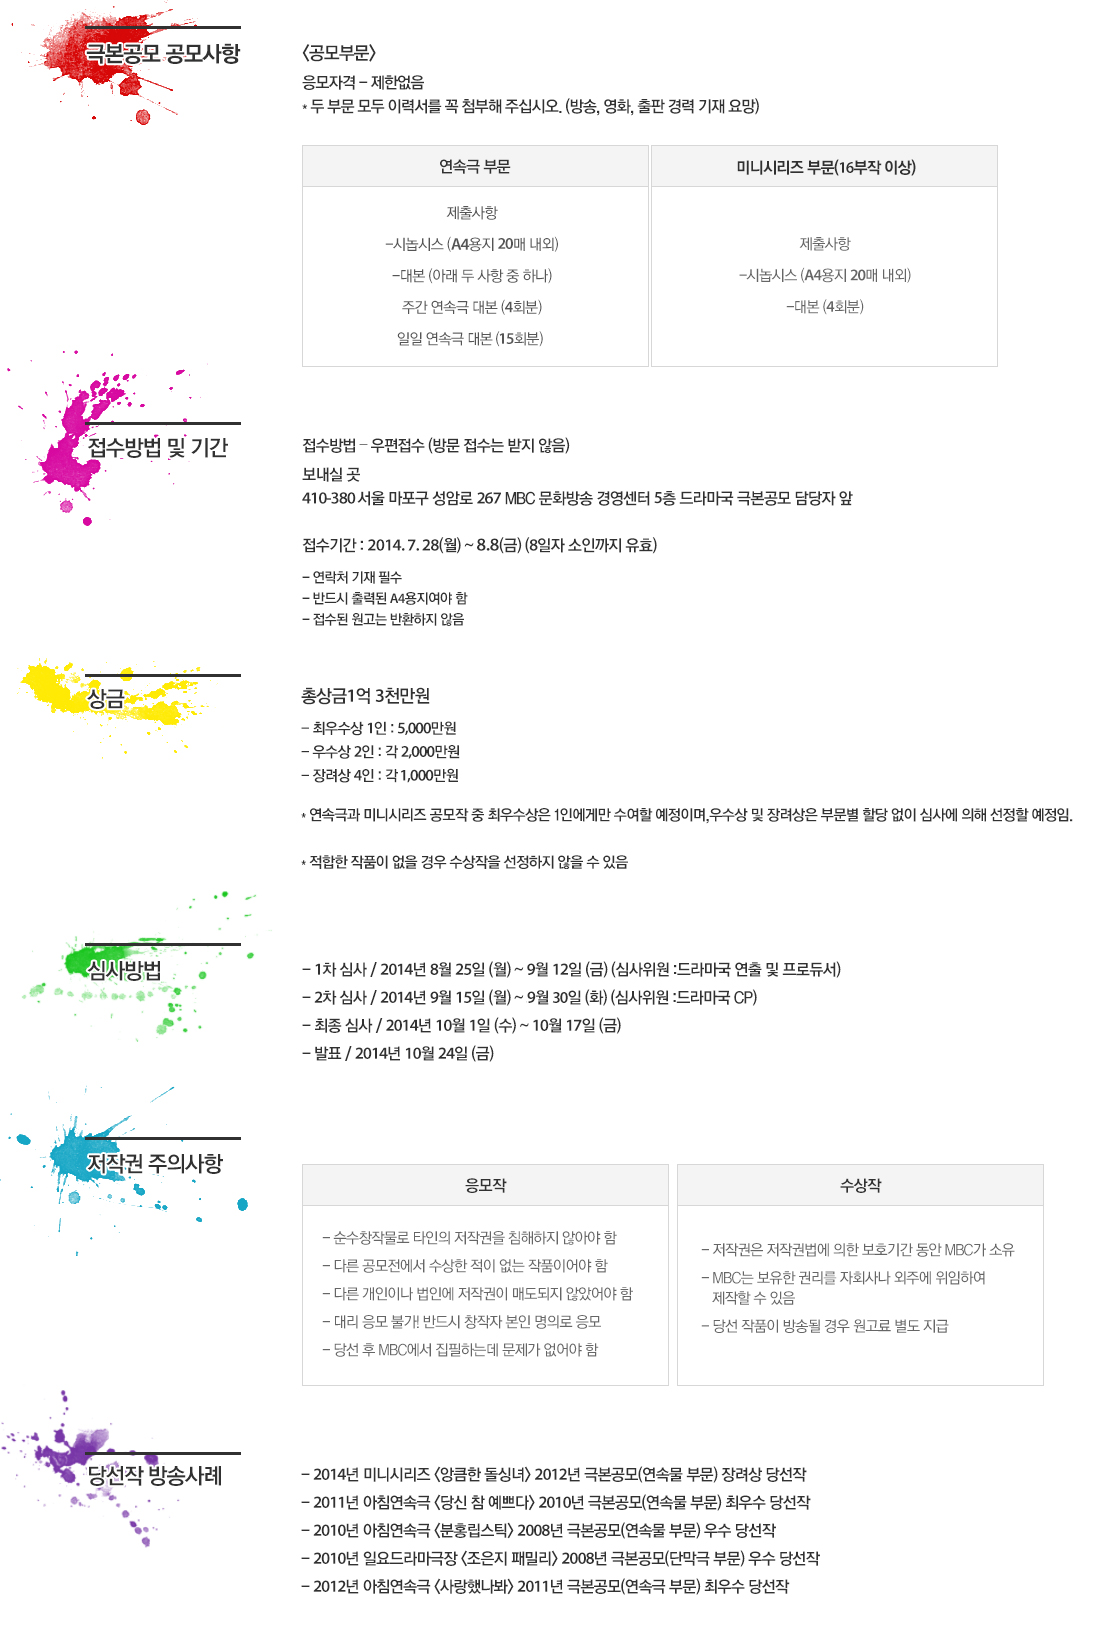 2014 MBC 드라마 극본공모 관련 상세내용